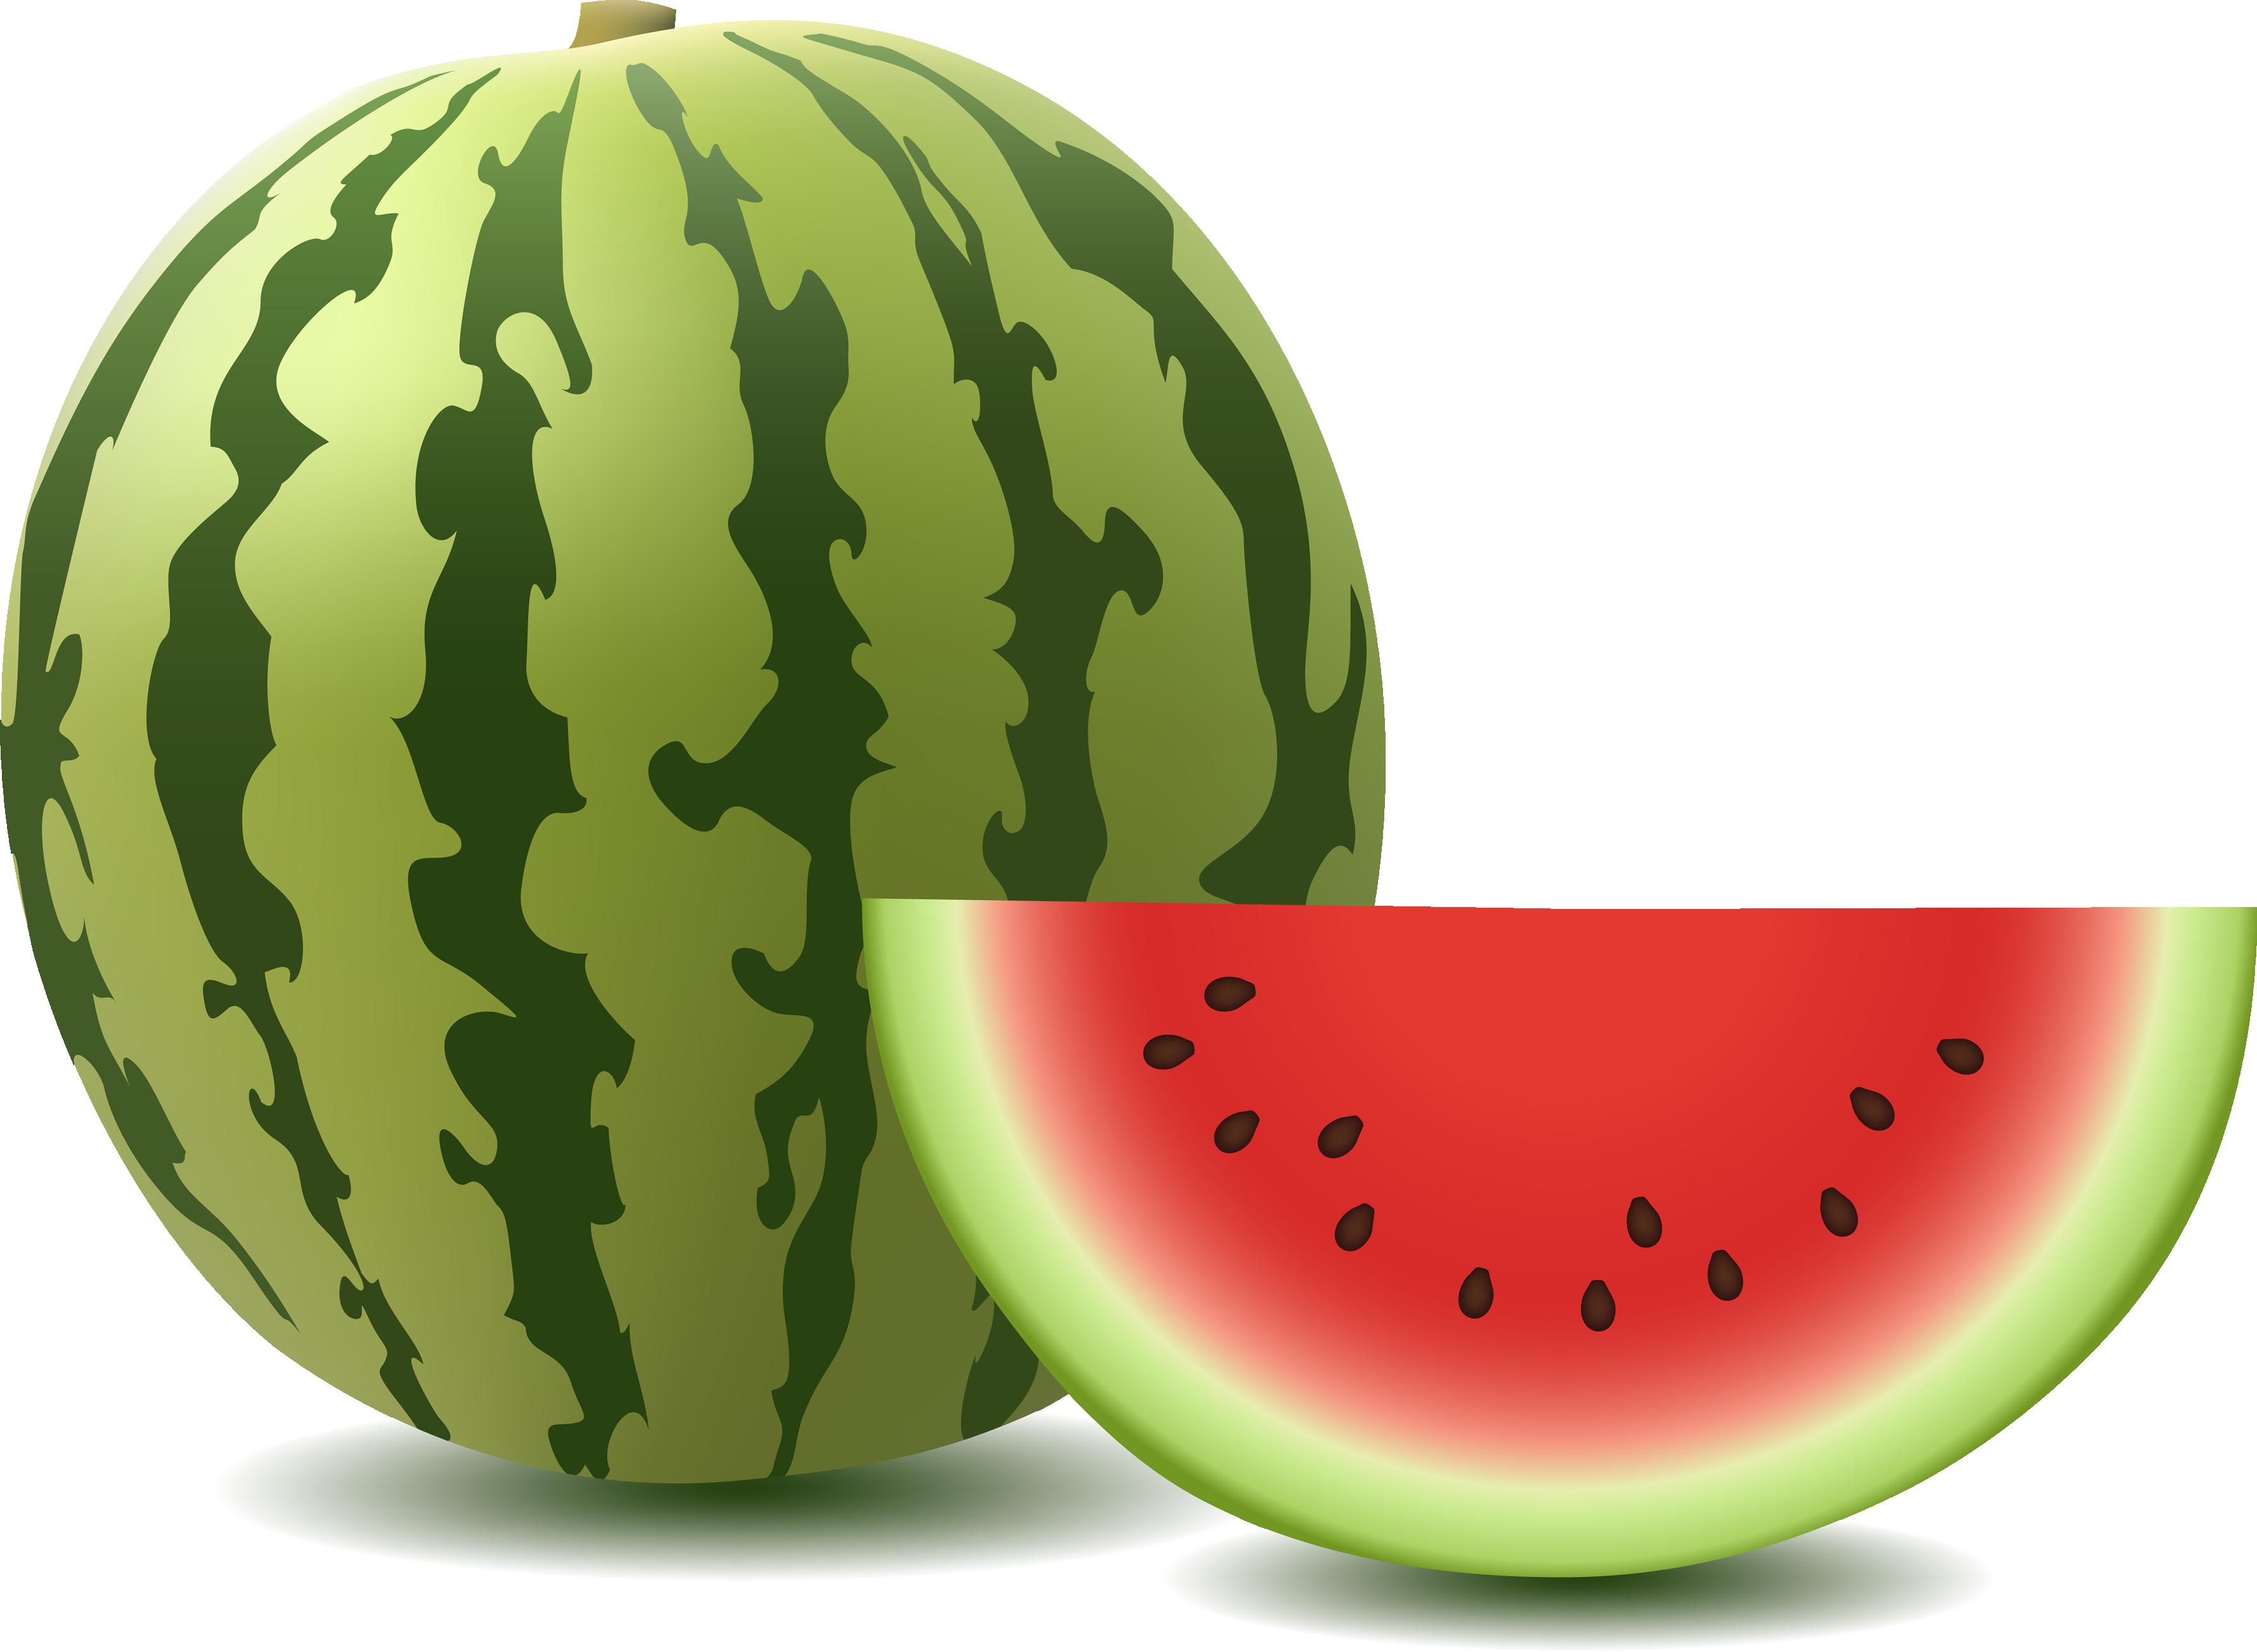 Watermelon clipart scared Watermelon Art Art Clip Sad